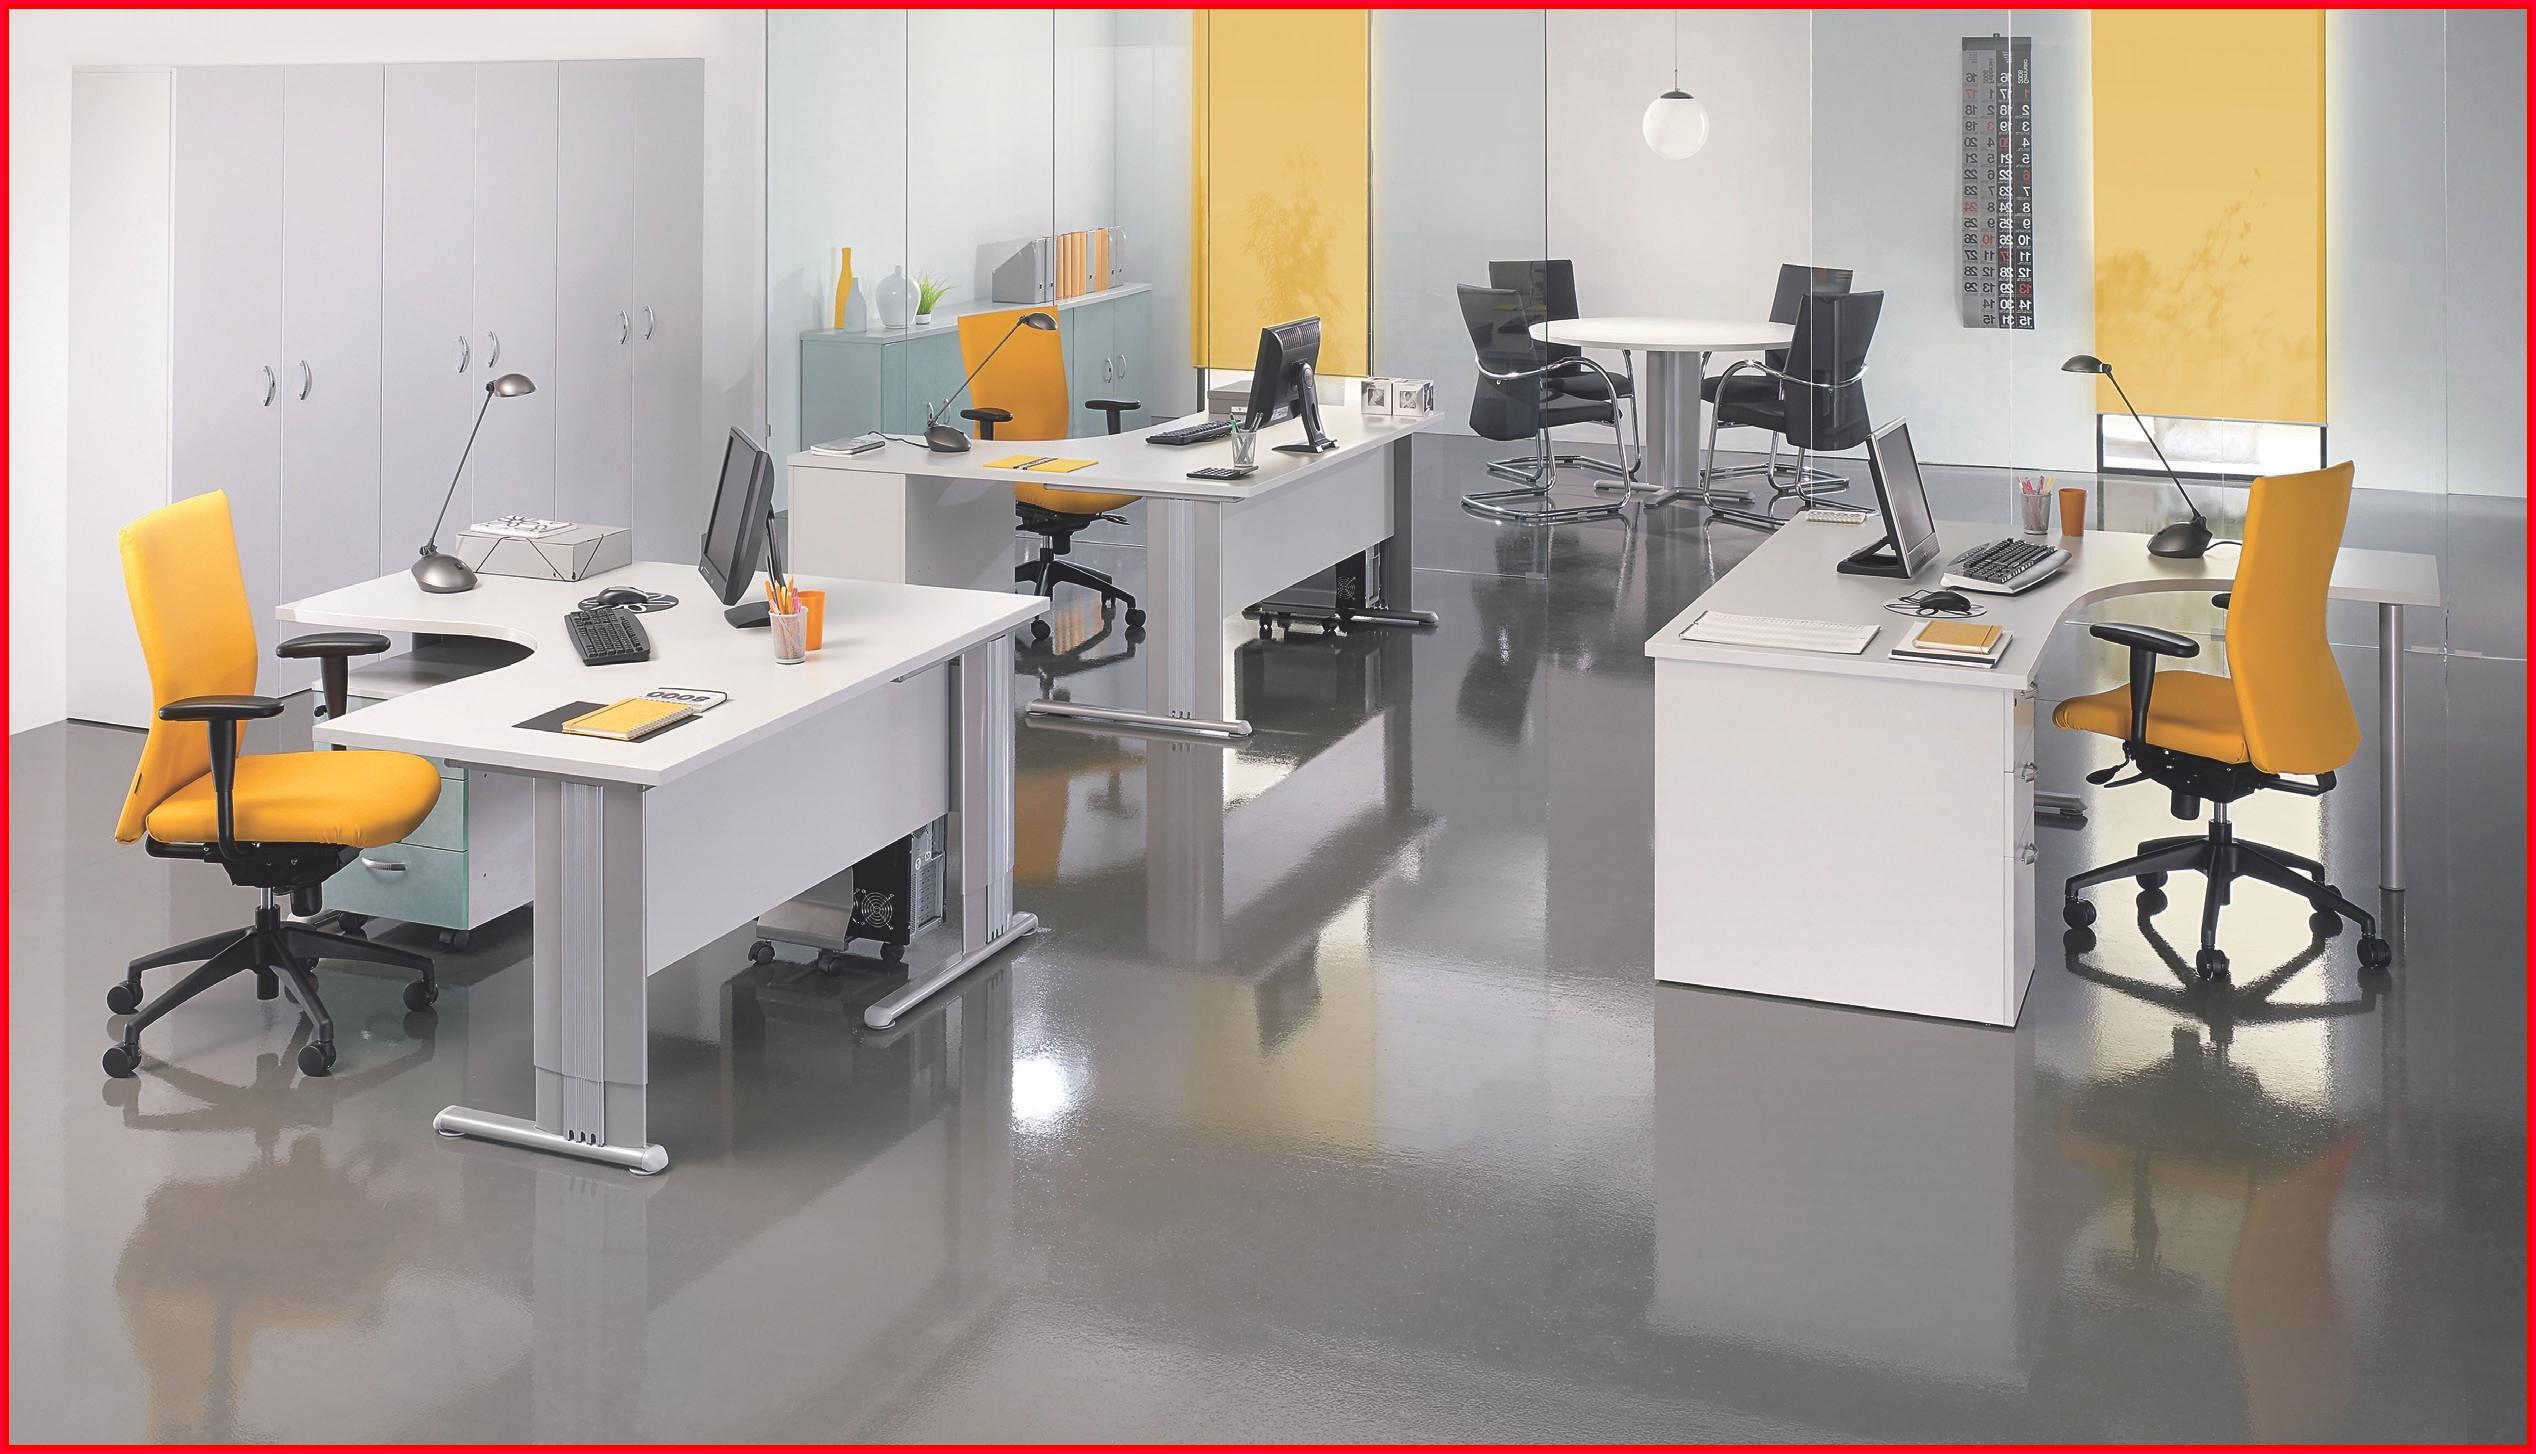 Muebles De Oficina Madrid 0gdr Muebles Oficina Madrid Elegante Muebles Icina Madrid